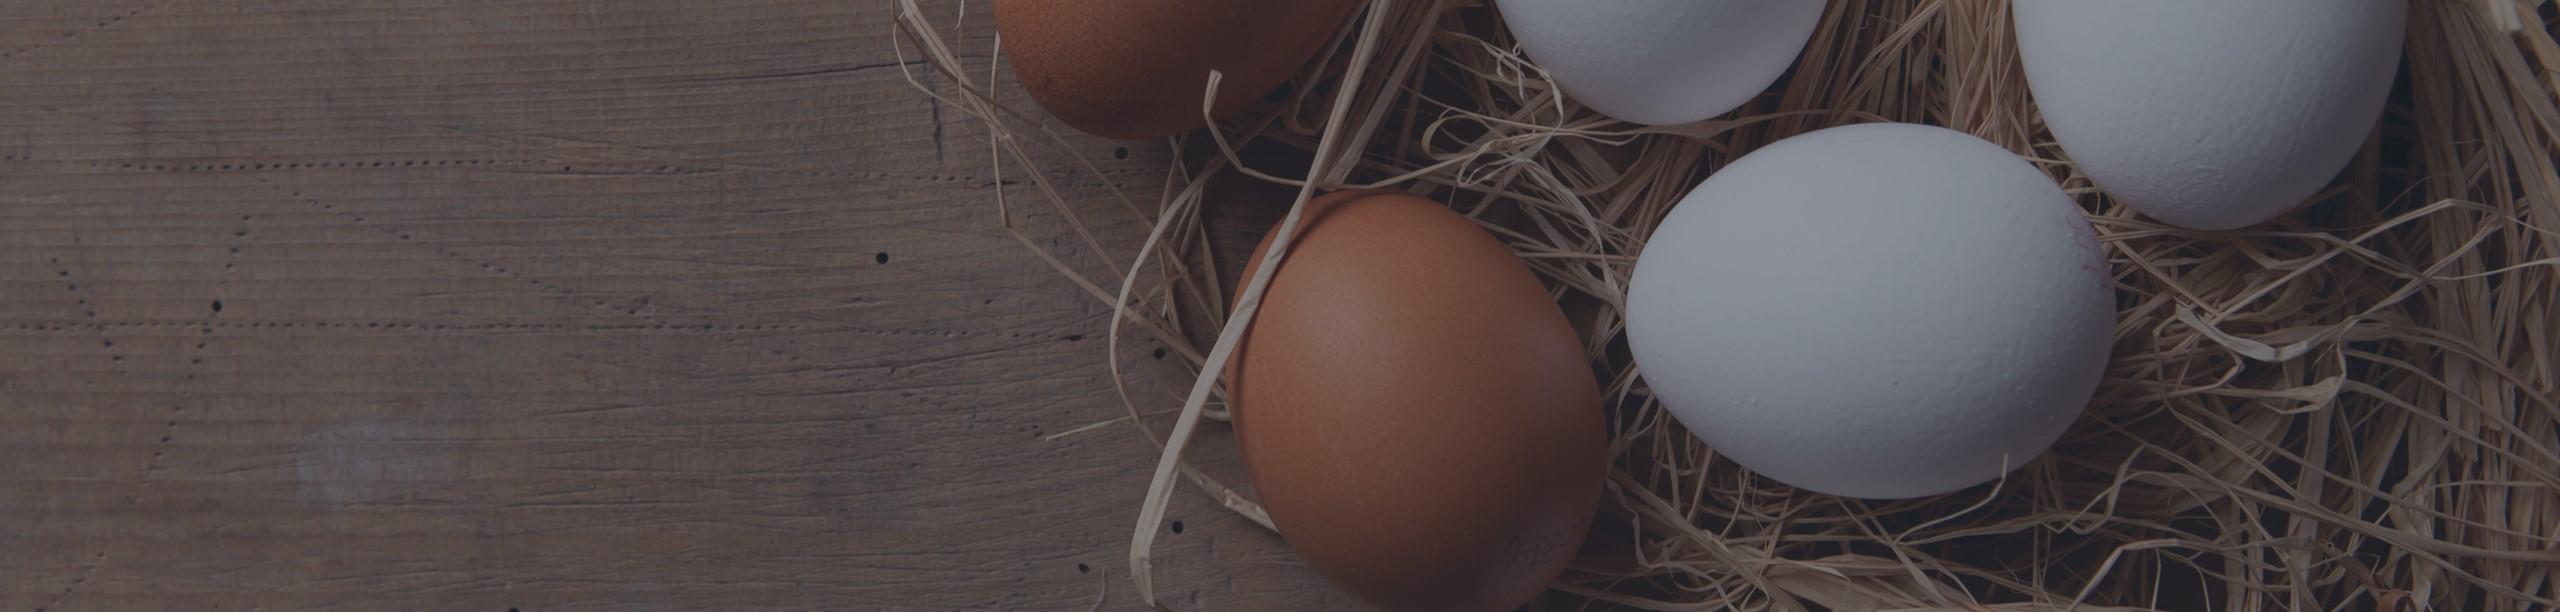 Eggs1-3